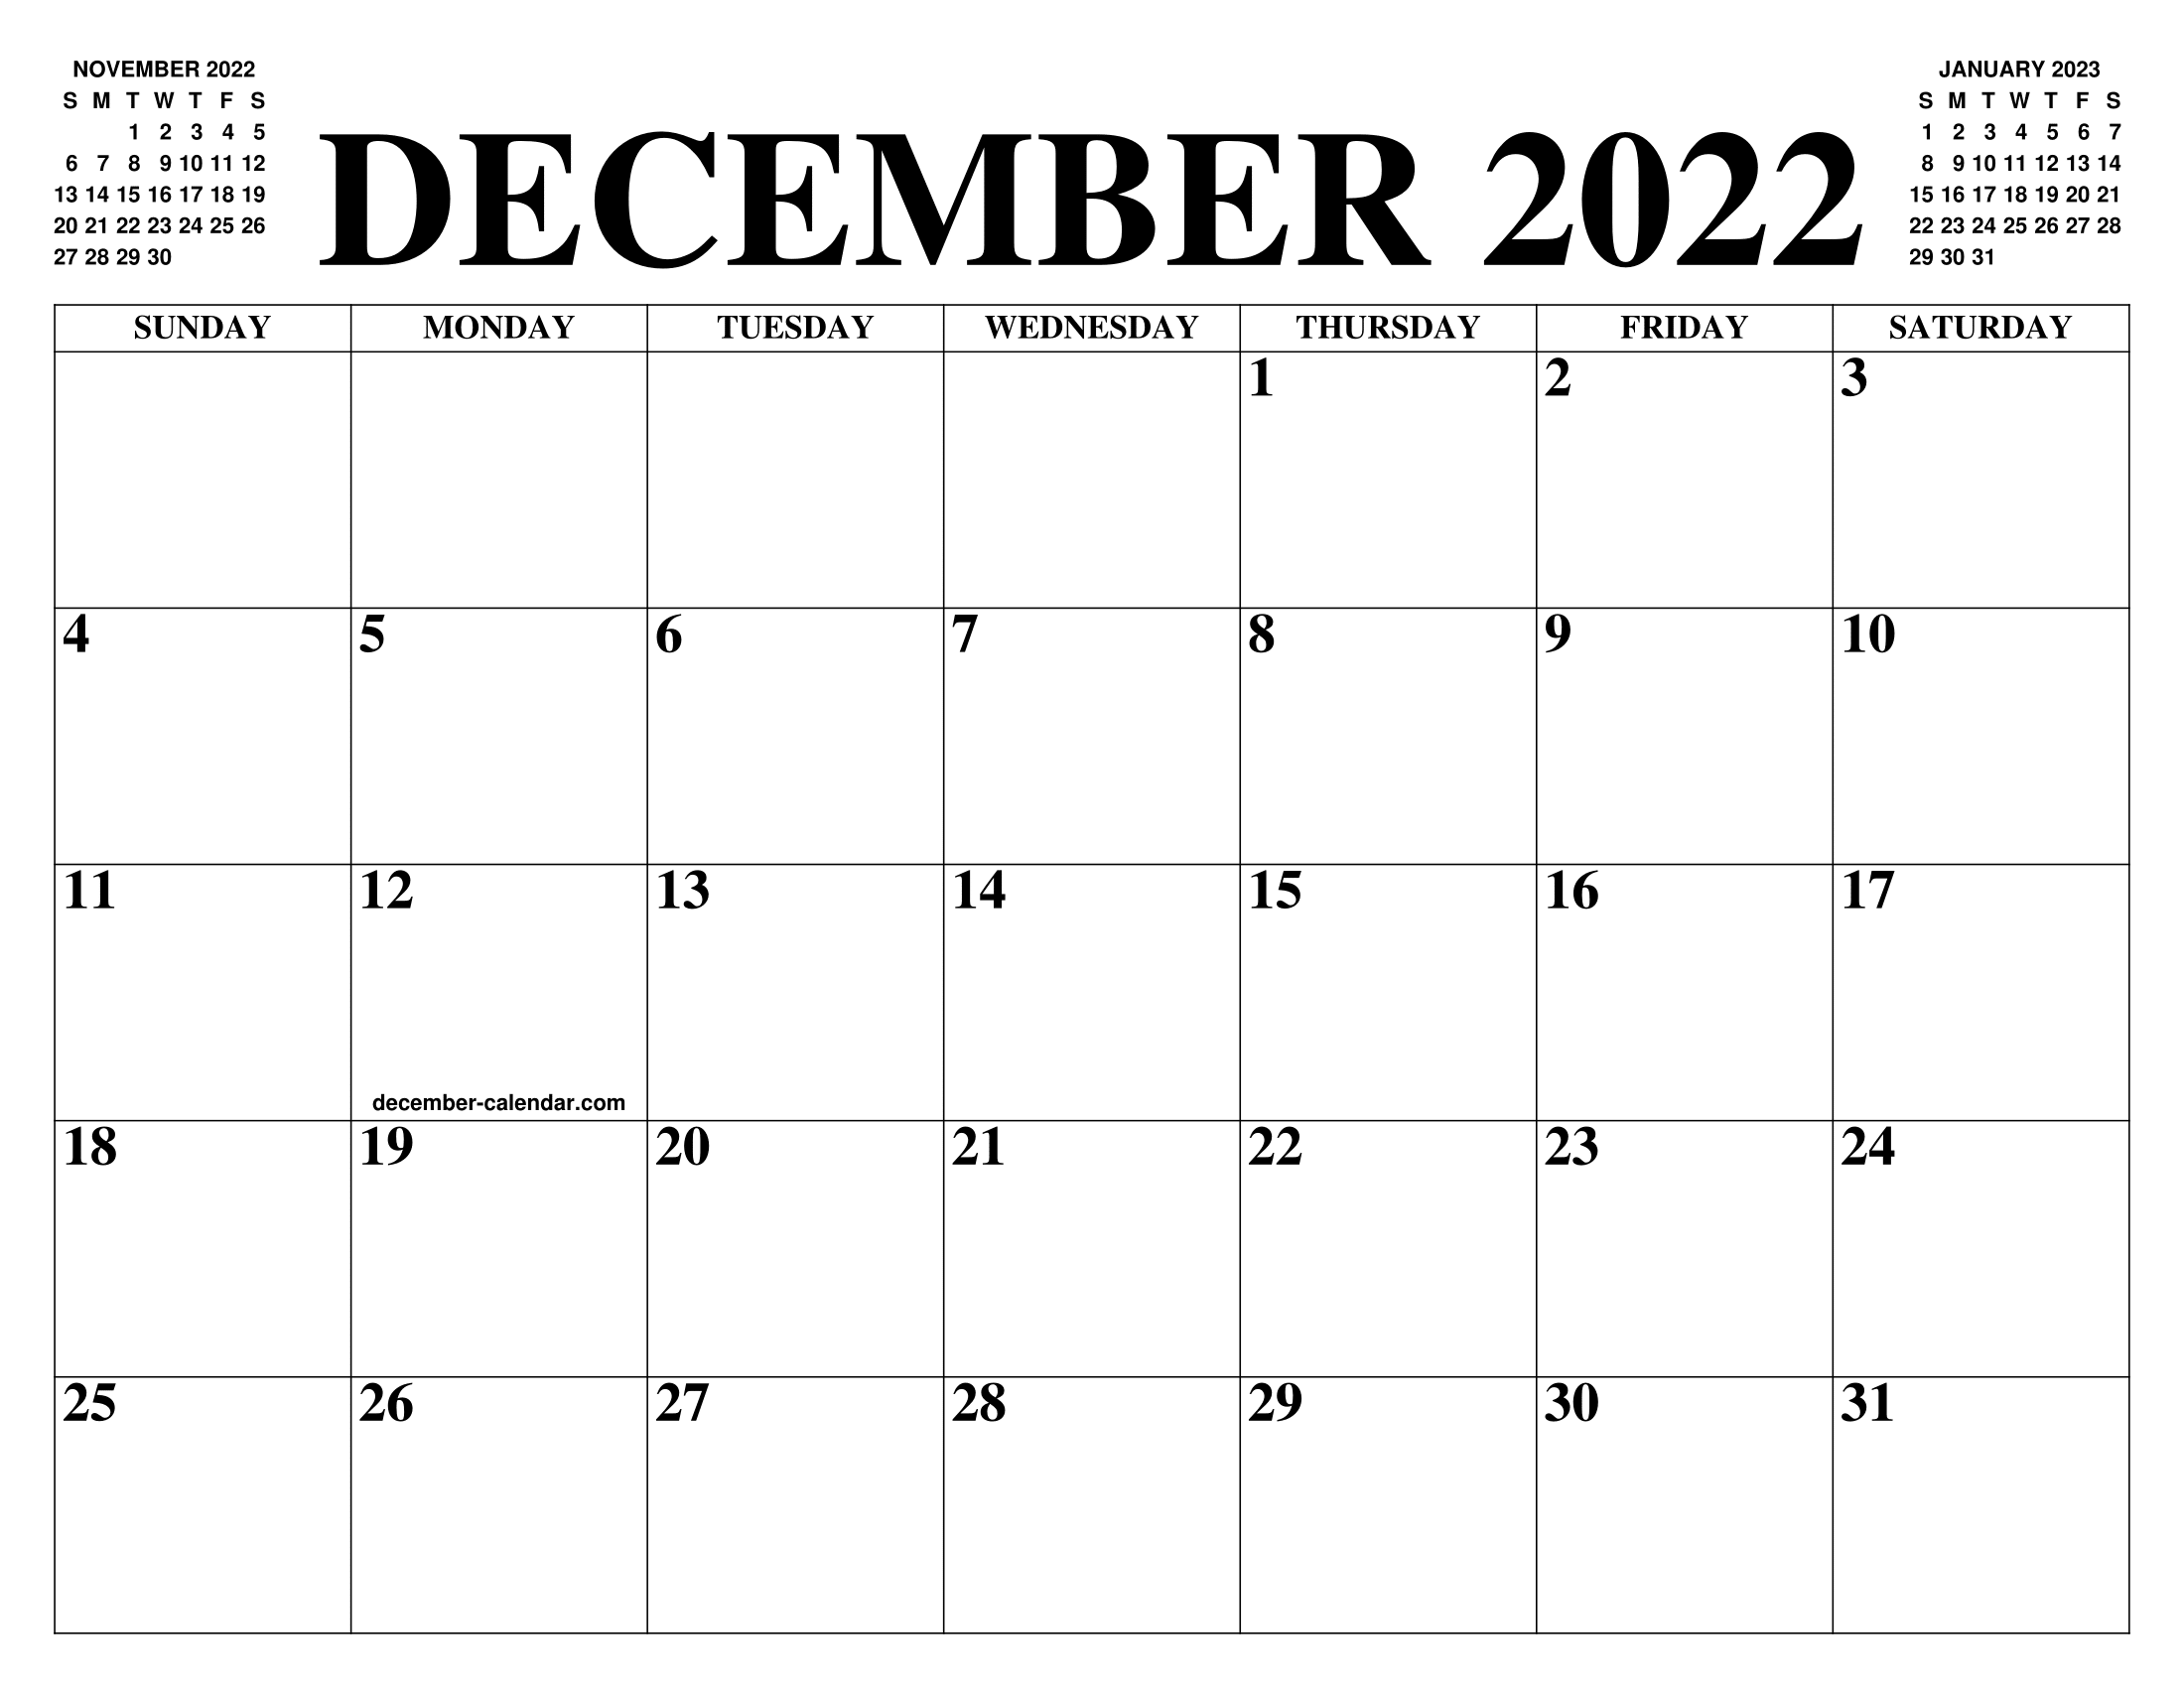 December 2023 And January 2022 Calendar.December 2022 Calendar Of The Month Free Printable December Calendar Of The Year Agenda